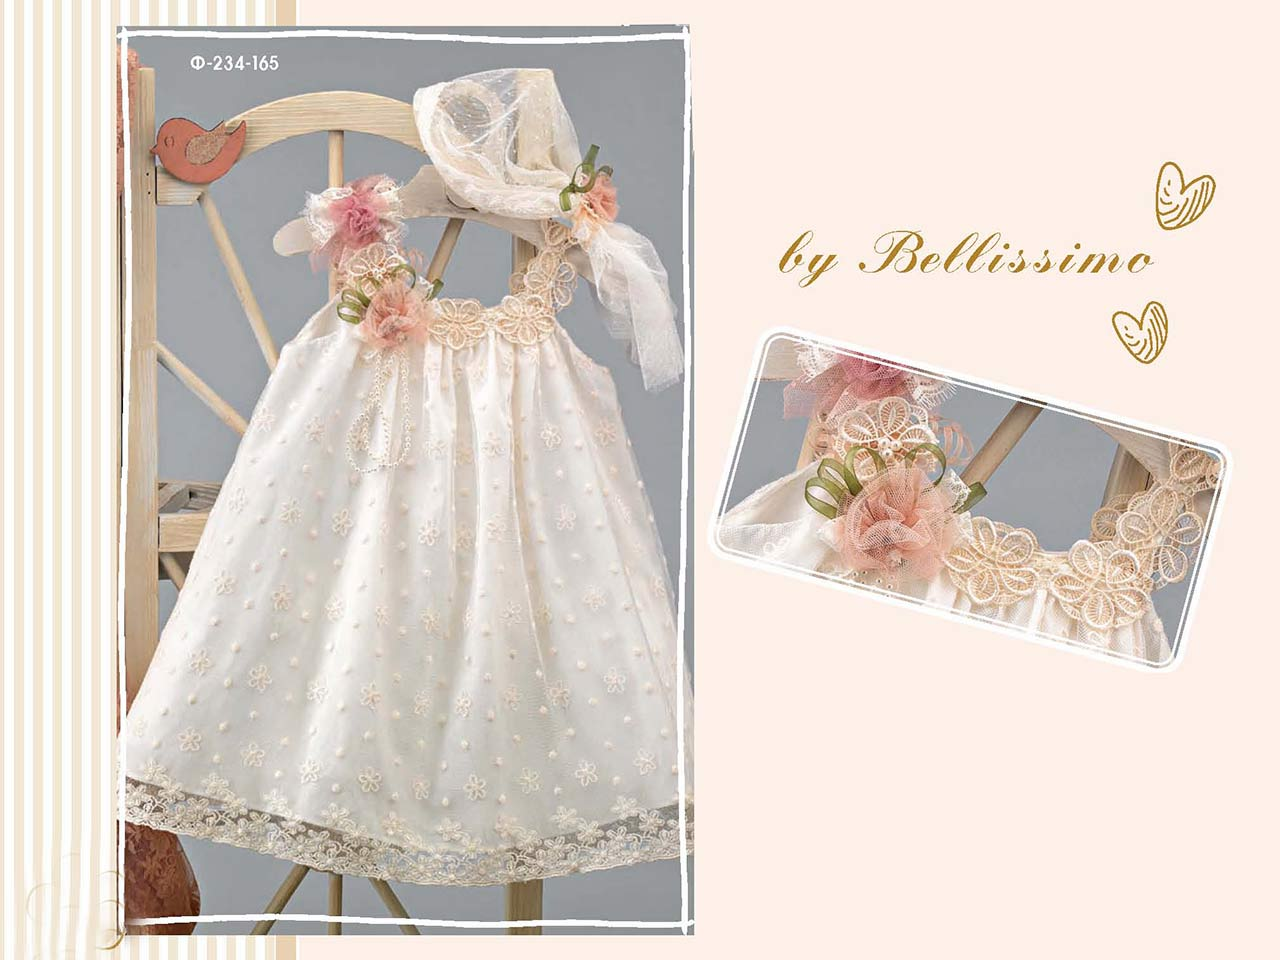 6d0924f4e7df ... Βαπτιστικό Φόρεμα Τούλινη Πουά Δαντέλα. 🔍. vaptistiko-forema-f234-165